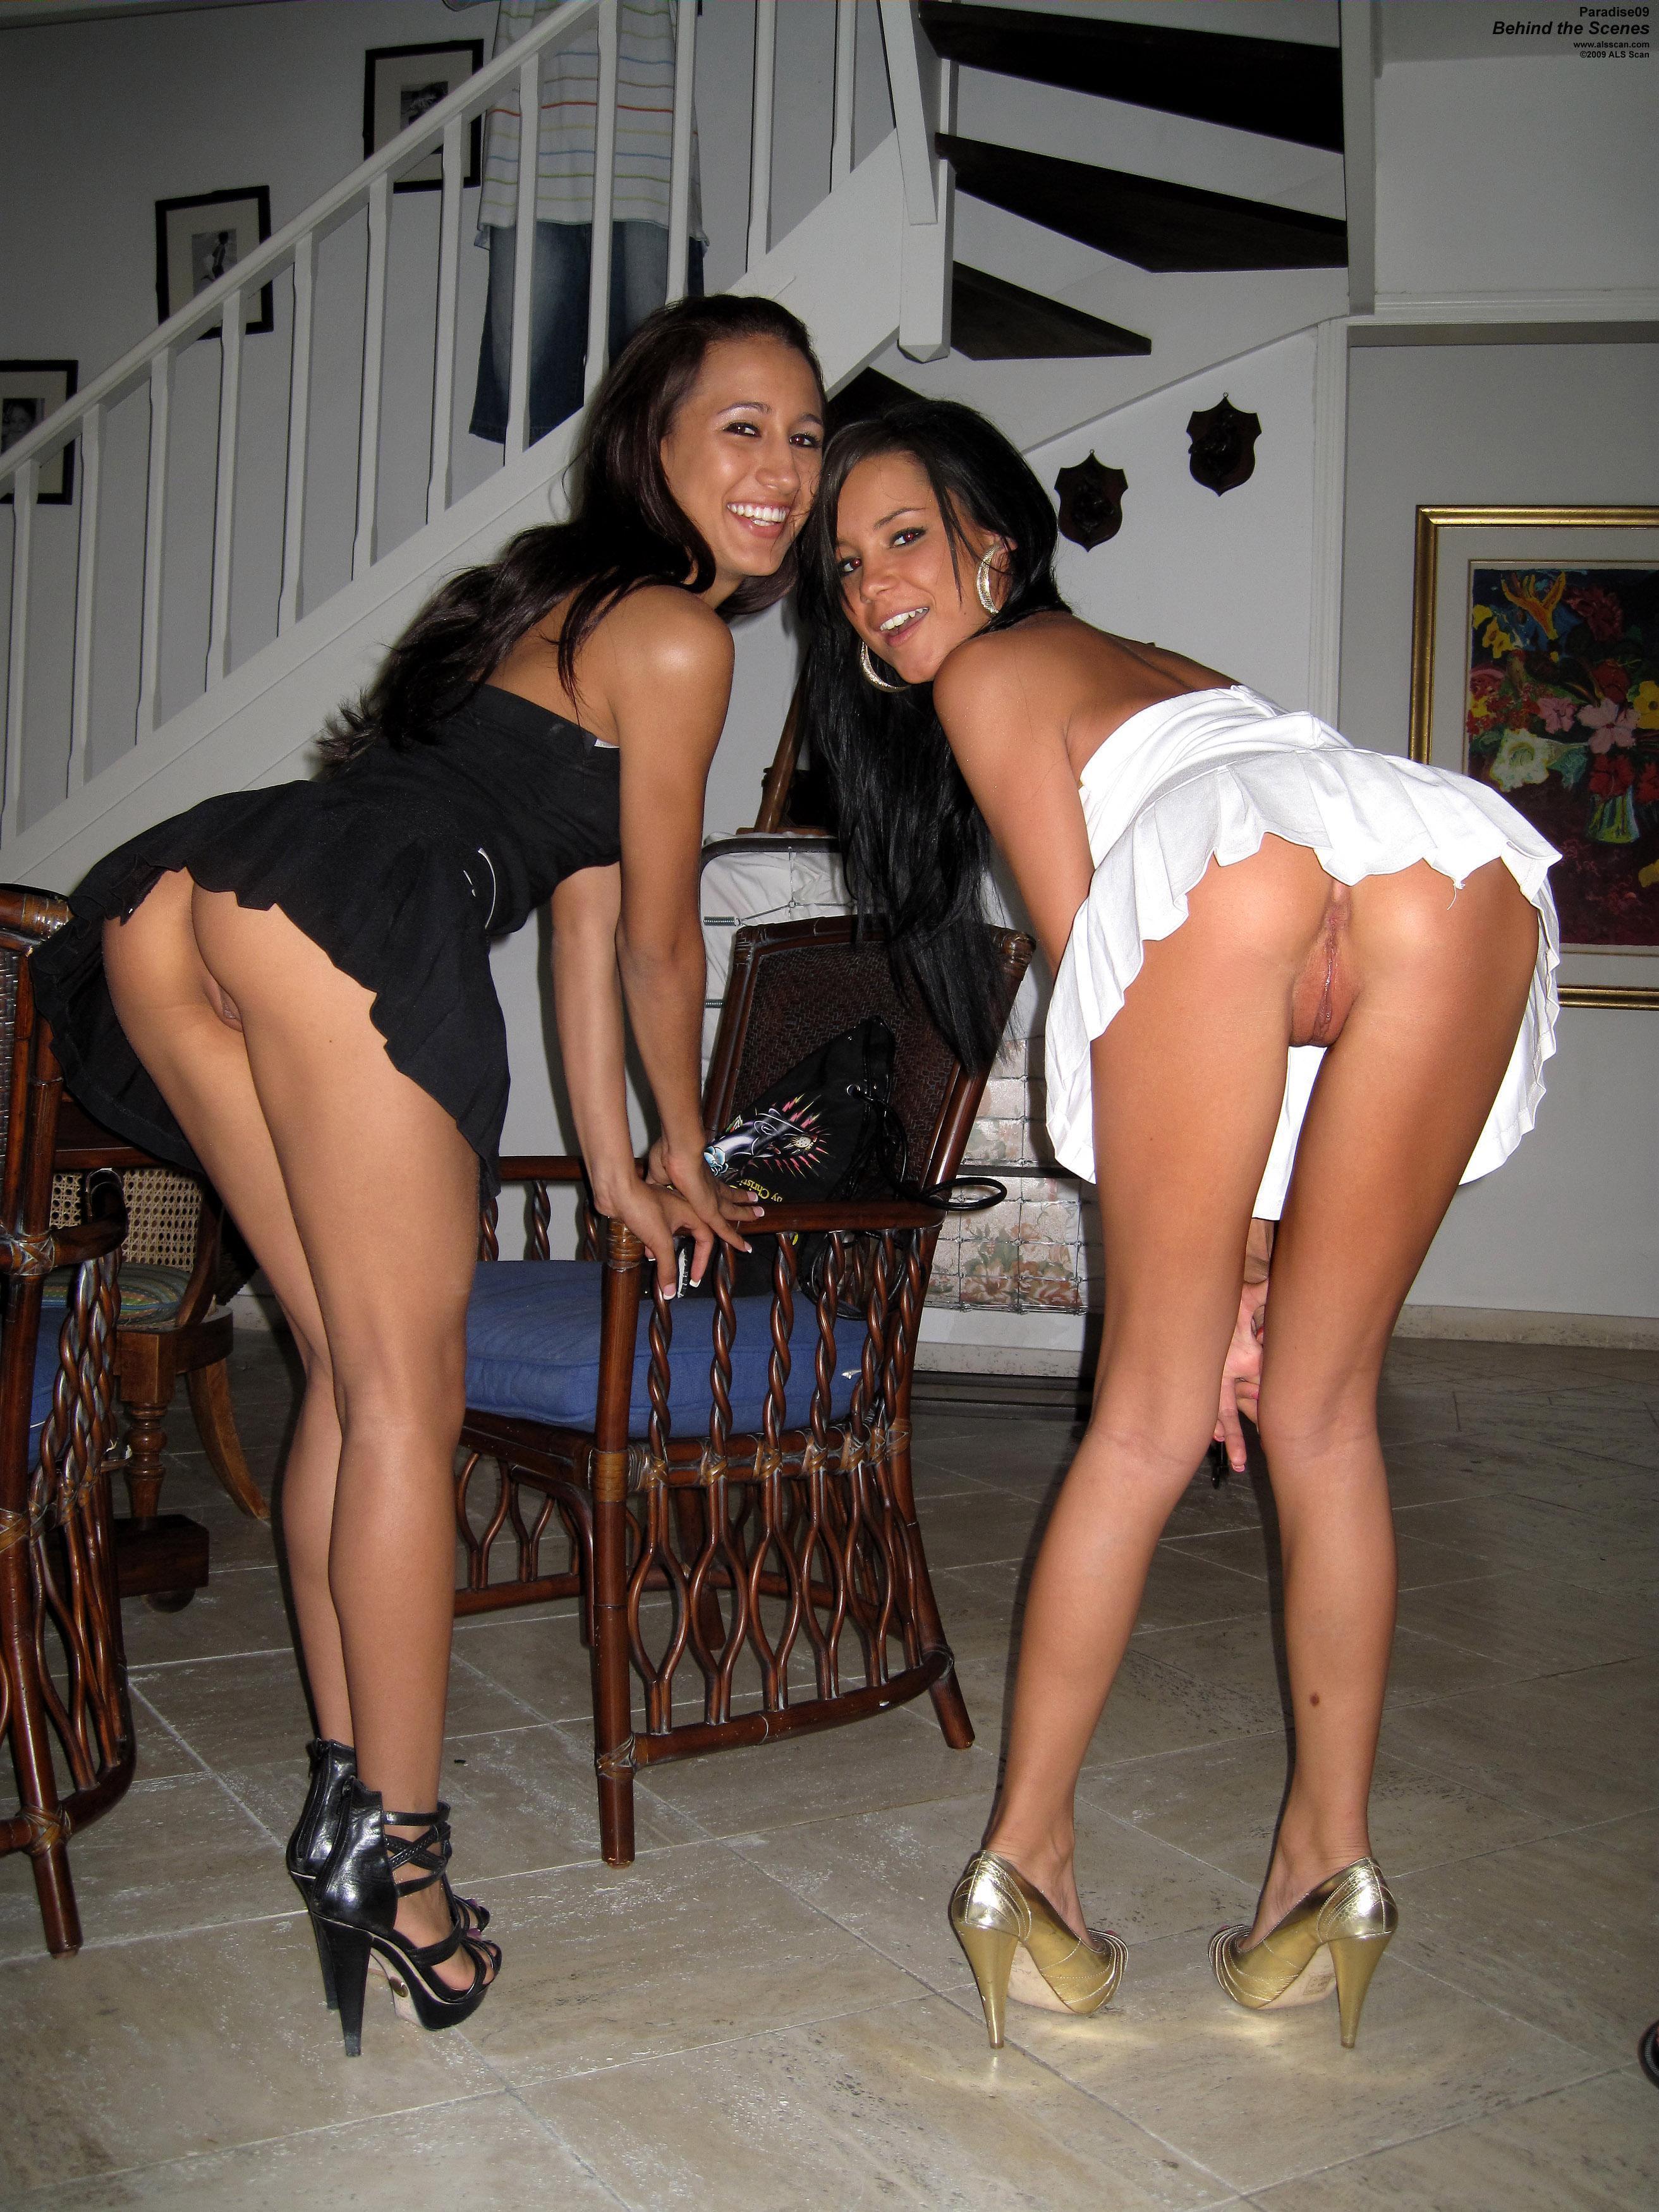 pantyhose asian porn pantyhose japanese sex de asians #young#teens#nonnude#upskirt#daughtersfriend#upskirtpanties#presentingherass#showingoff#teasing#blonde#homemade#rearview#amateur#slonik#ass